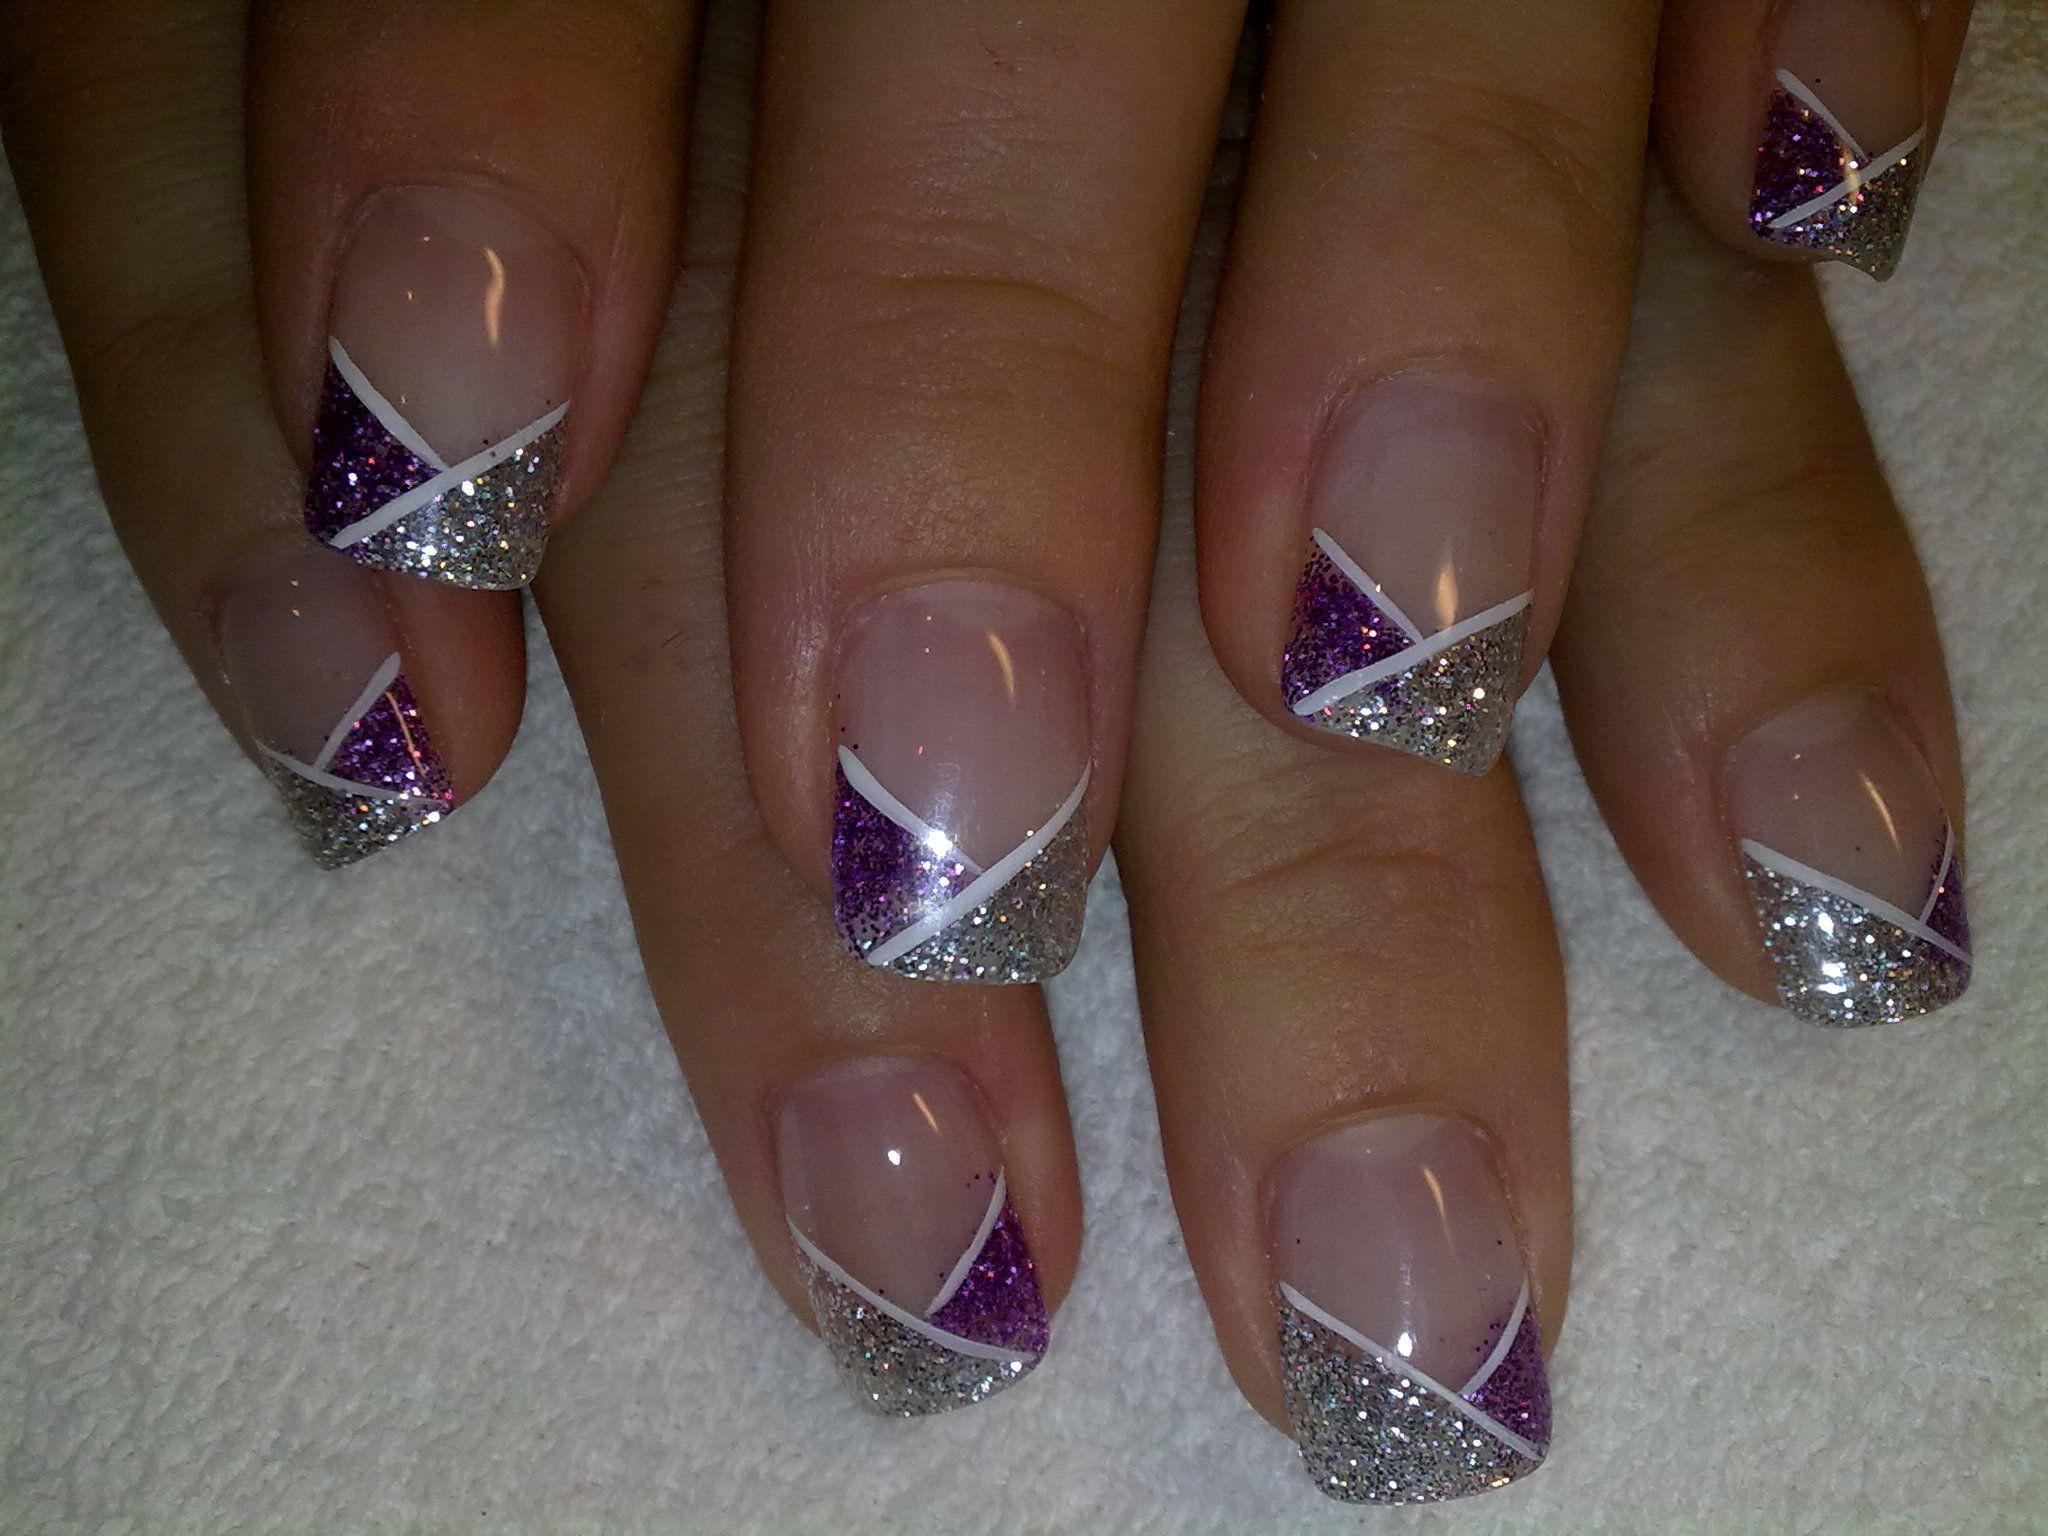 Gel nail art. I think I'll do this next